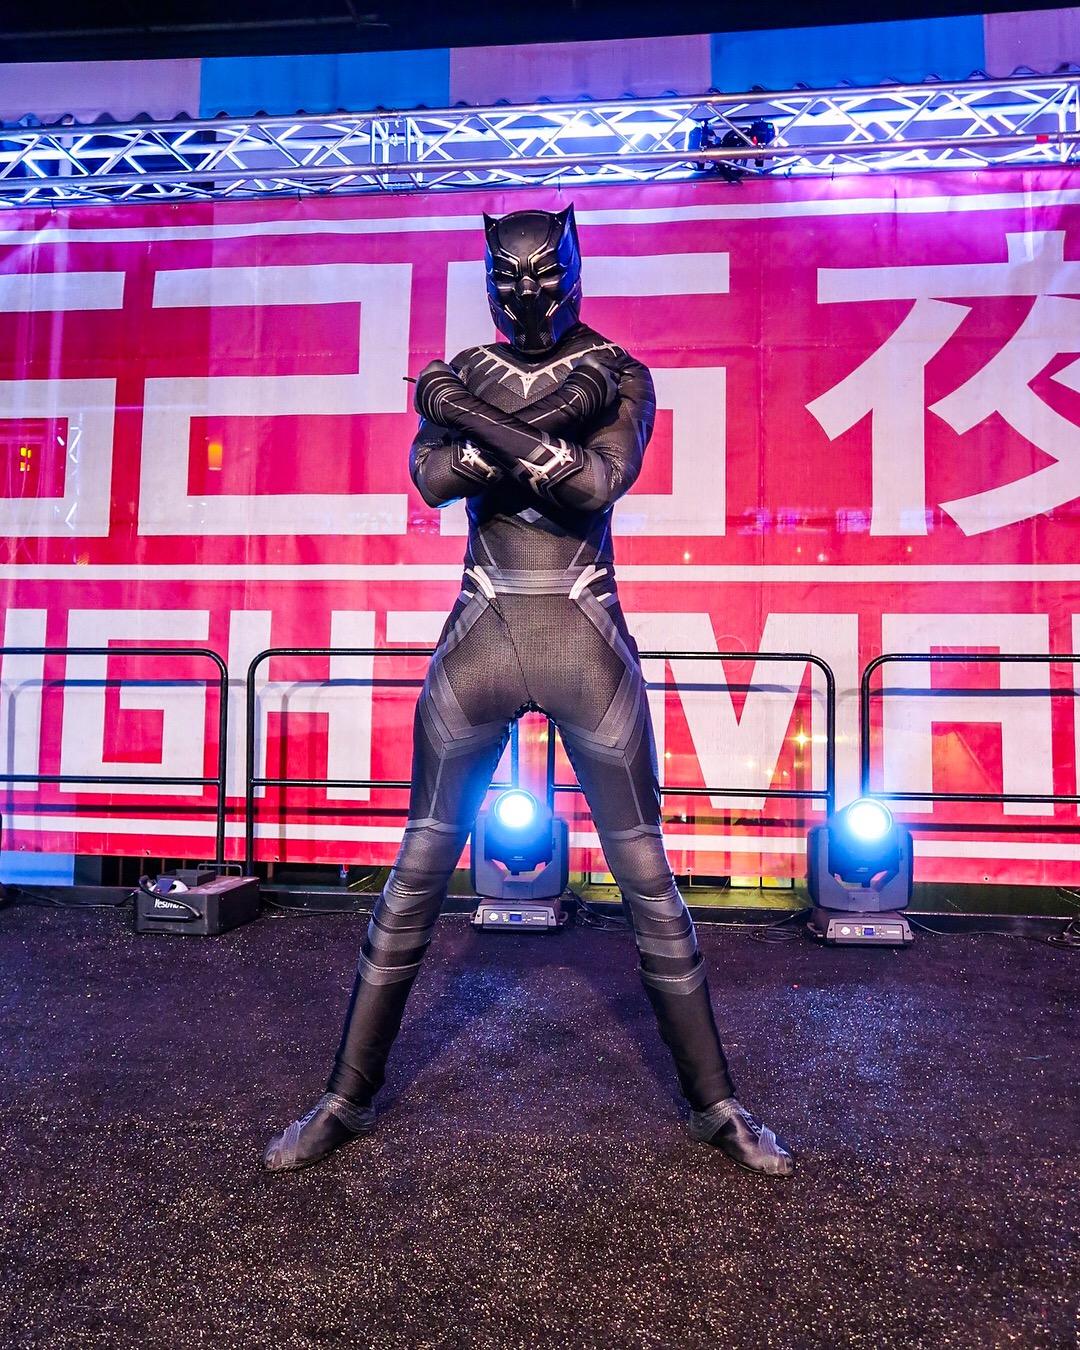 626-night-market-cosplay-contest-black-panther-1.JPG